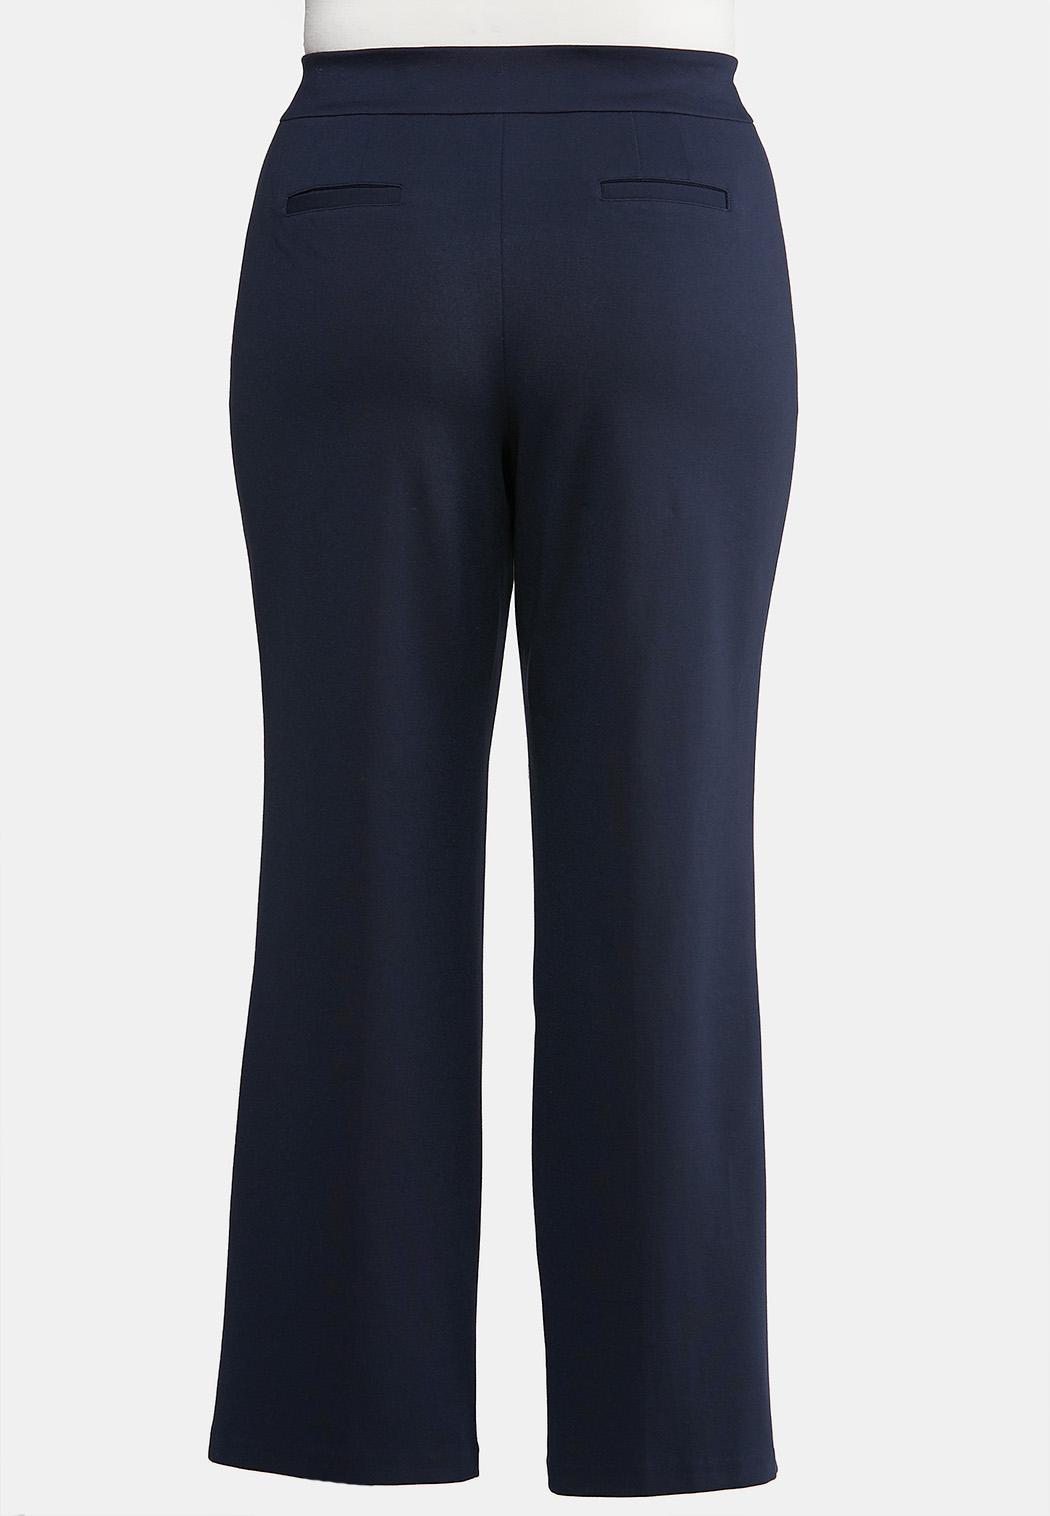 Plus Size Straight Leg Ponte Pants (Item #43919033)